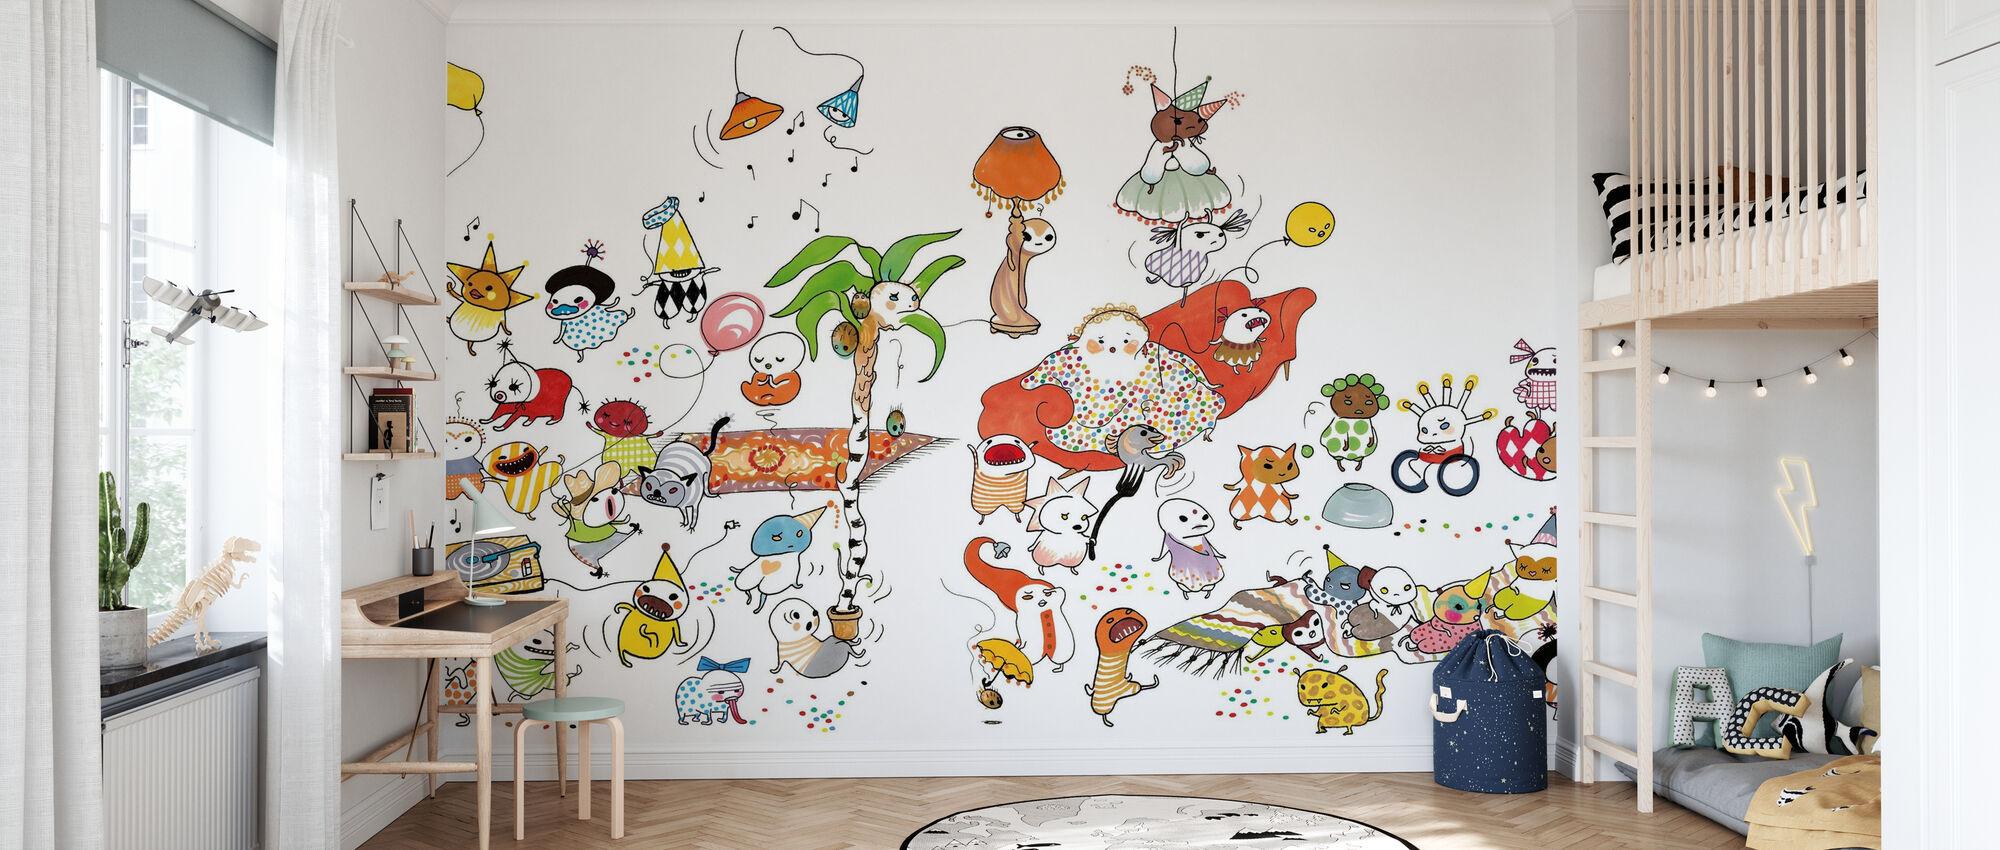 Fest XL - Wallpaper - Kids Room